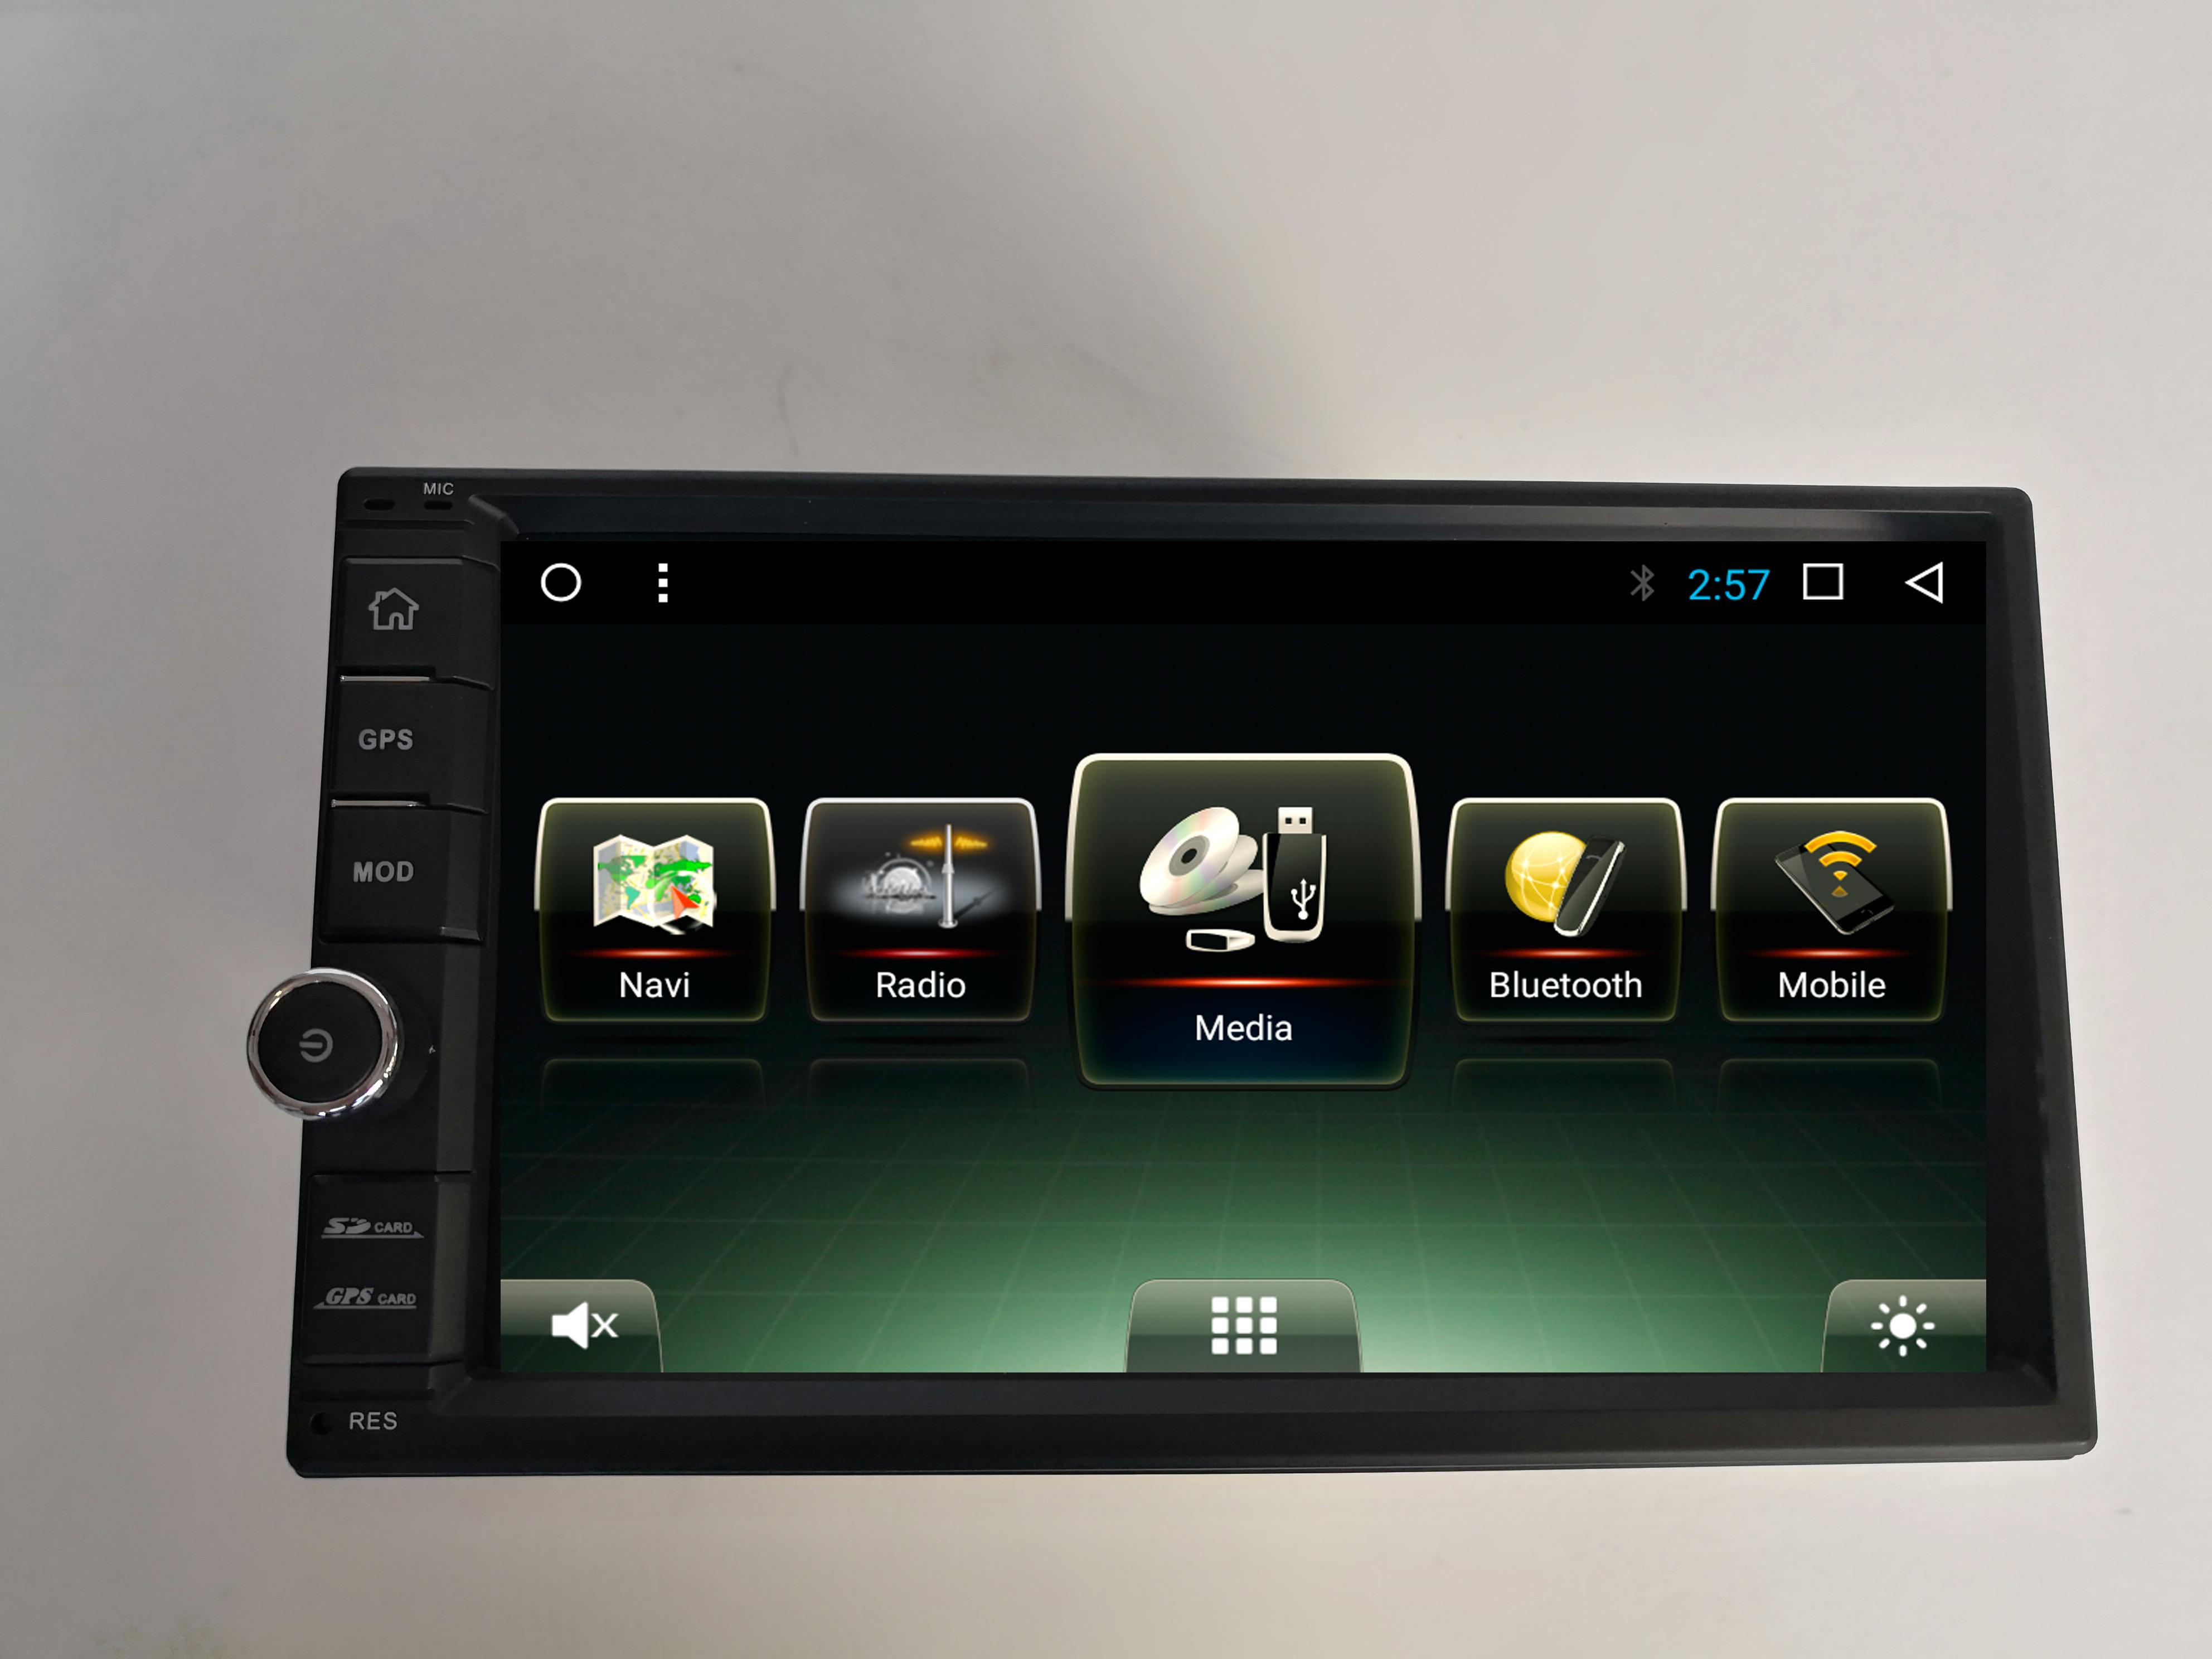 Штатная магнитола CARMEDIA U9-6503-T8 универсальная автомагнитола 2DIN на Android 7.1 msd489av u9